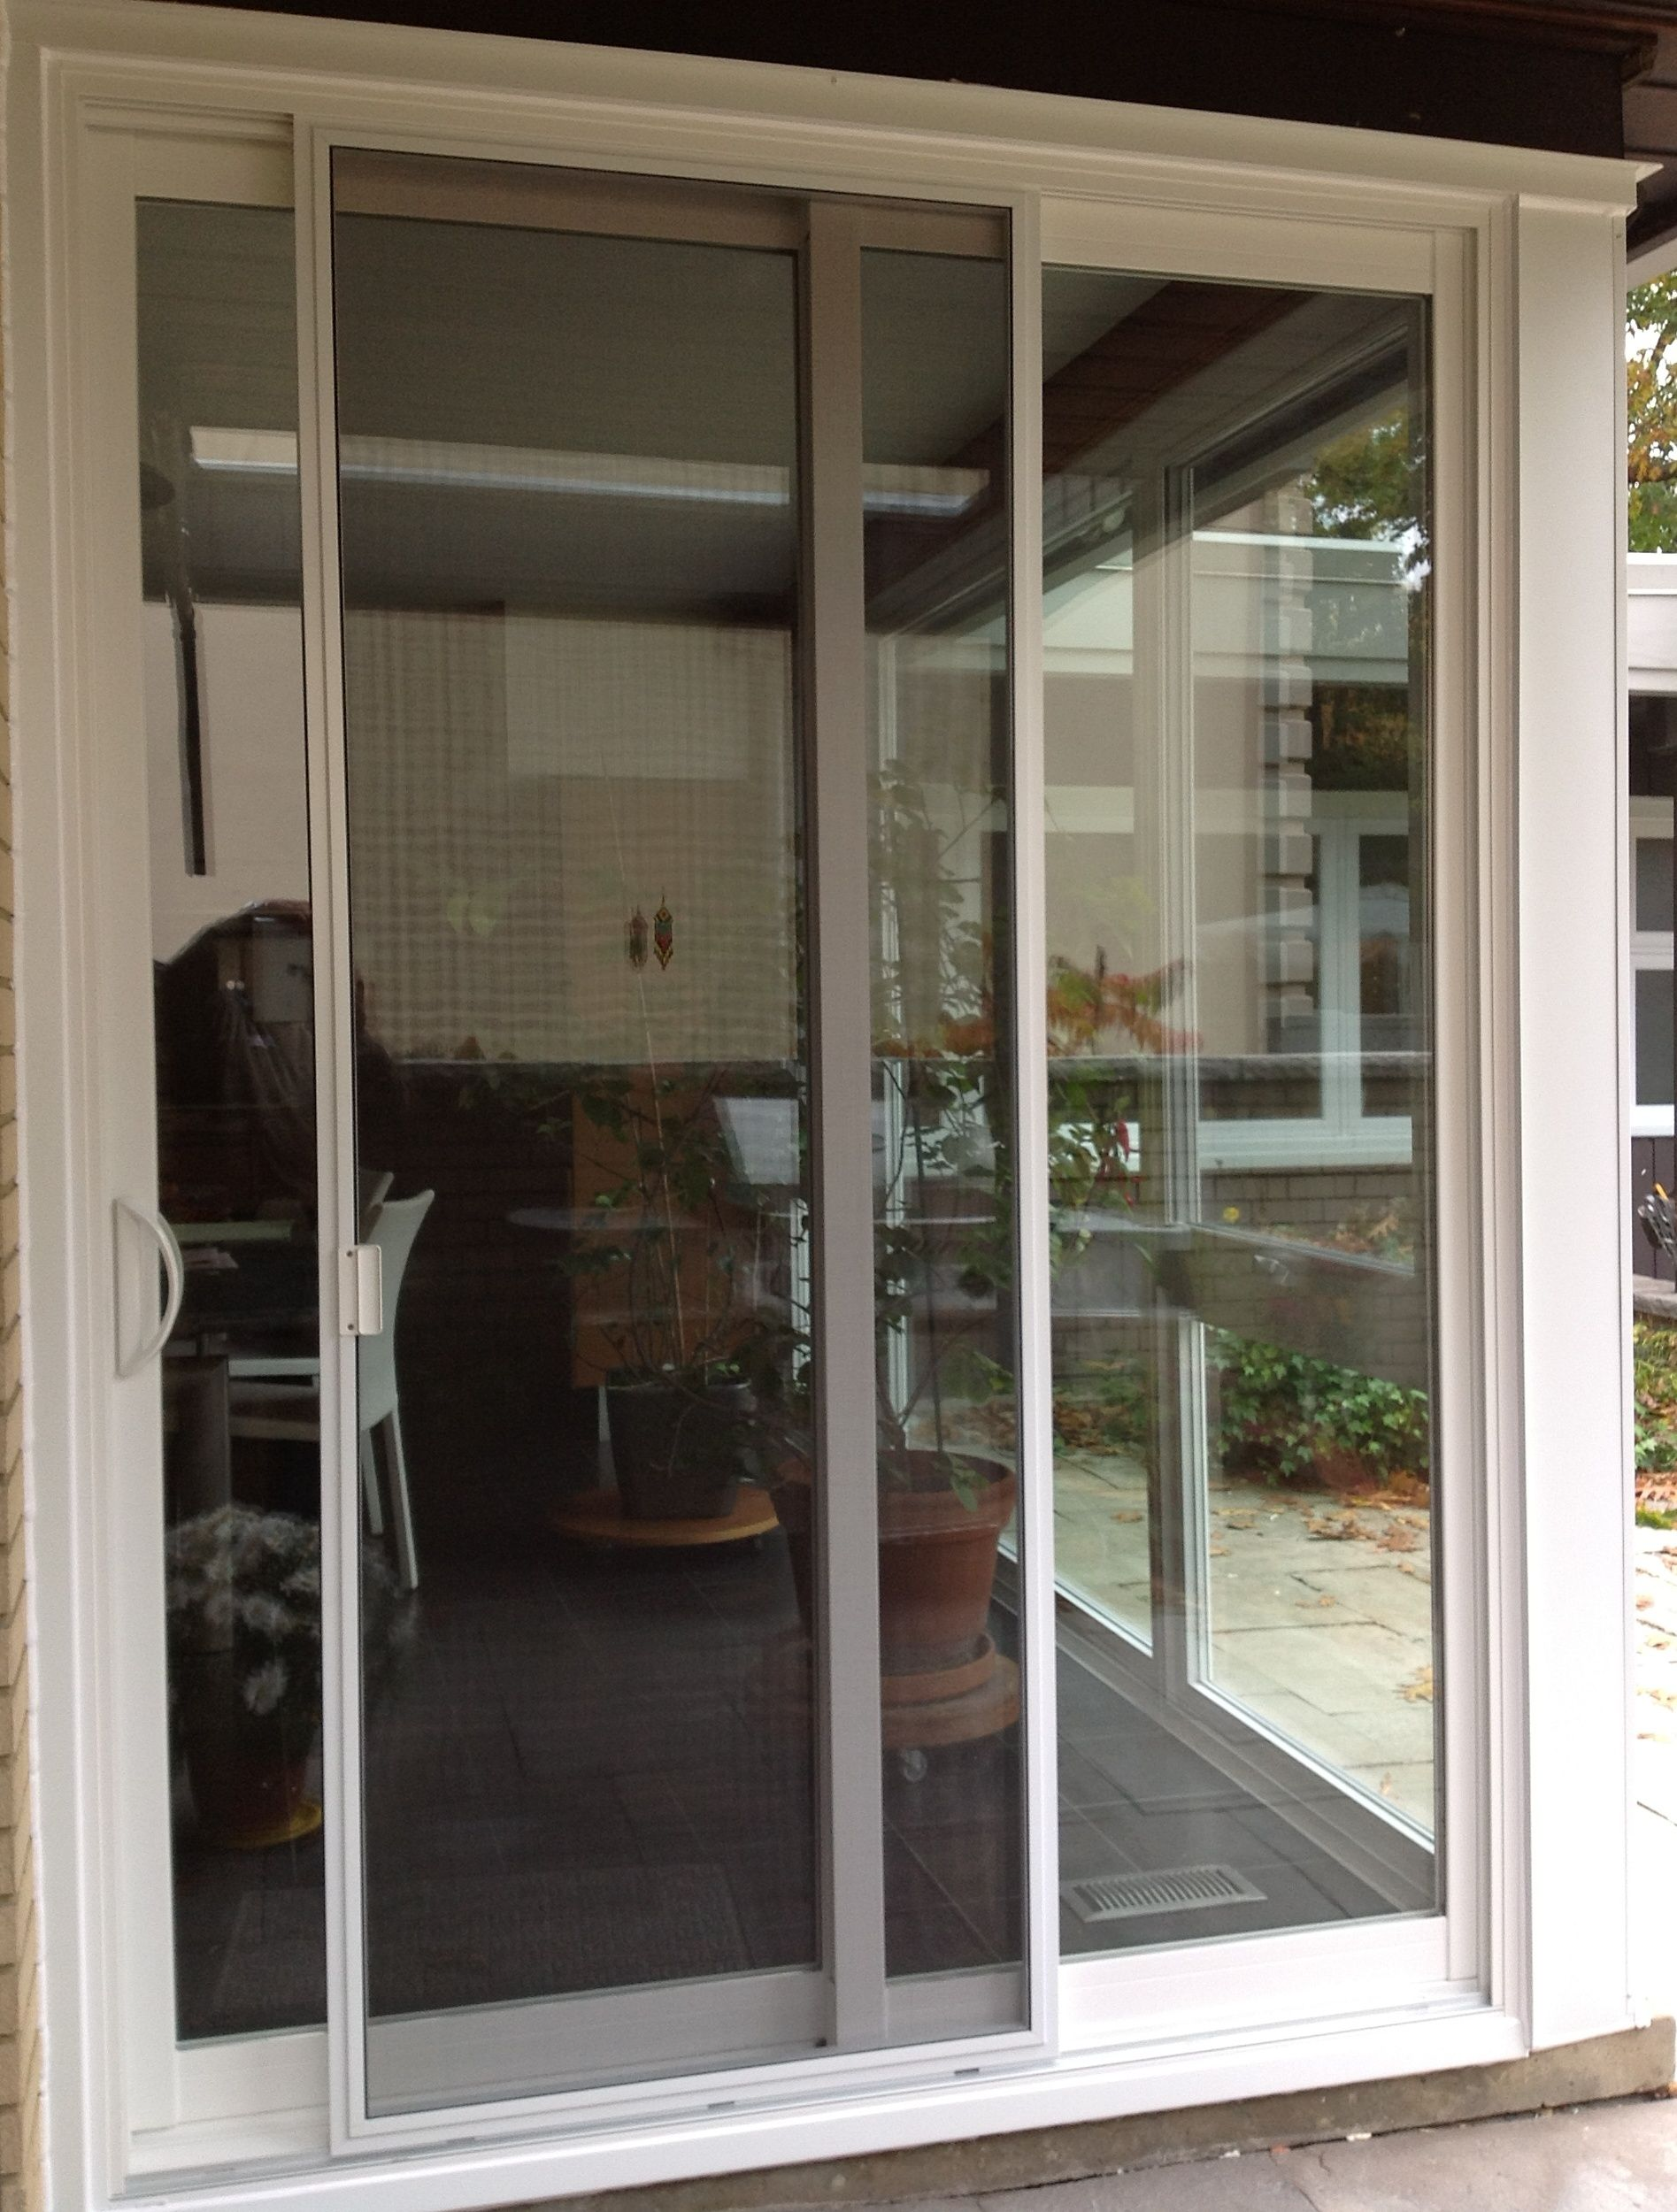 Sliding Screen Door For Apartment Balcony | http://togethersandia ...